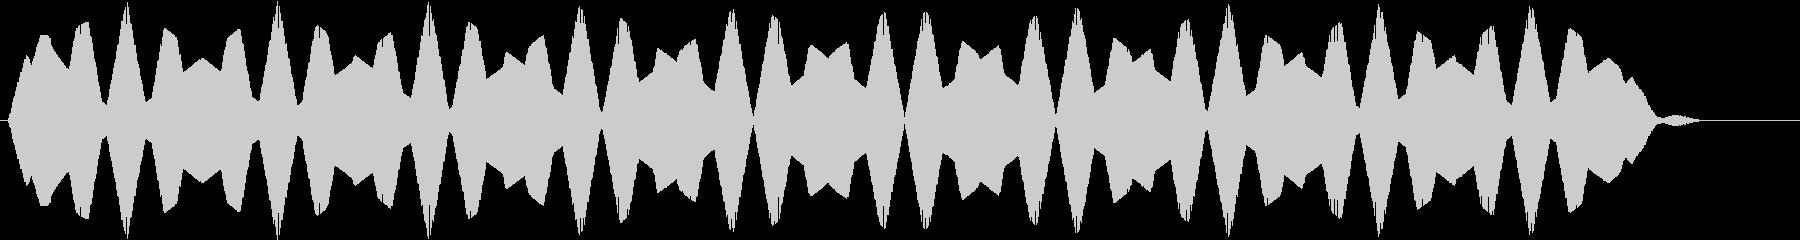 UFOが現れた効果音の未再生の波形